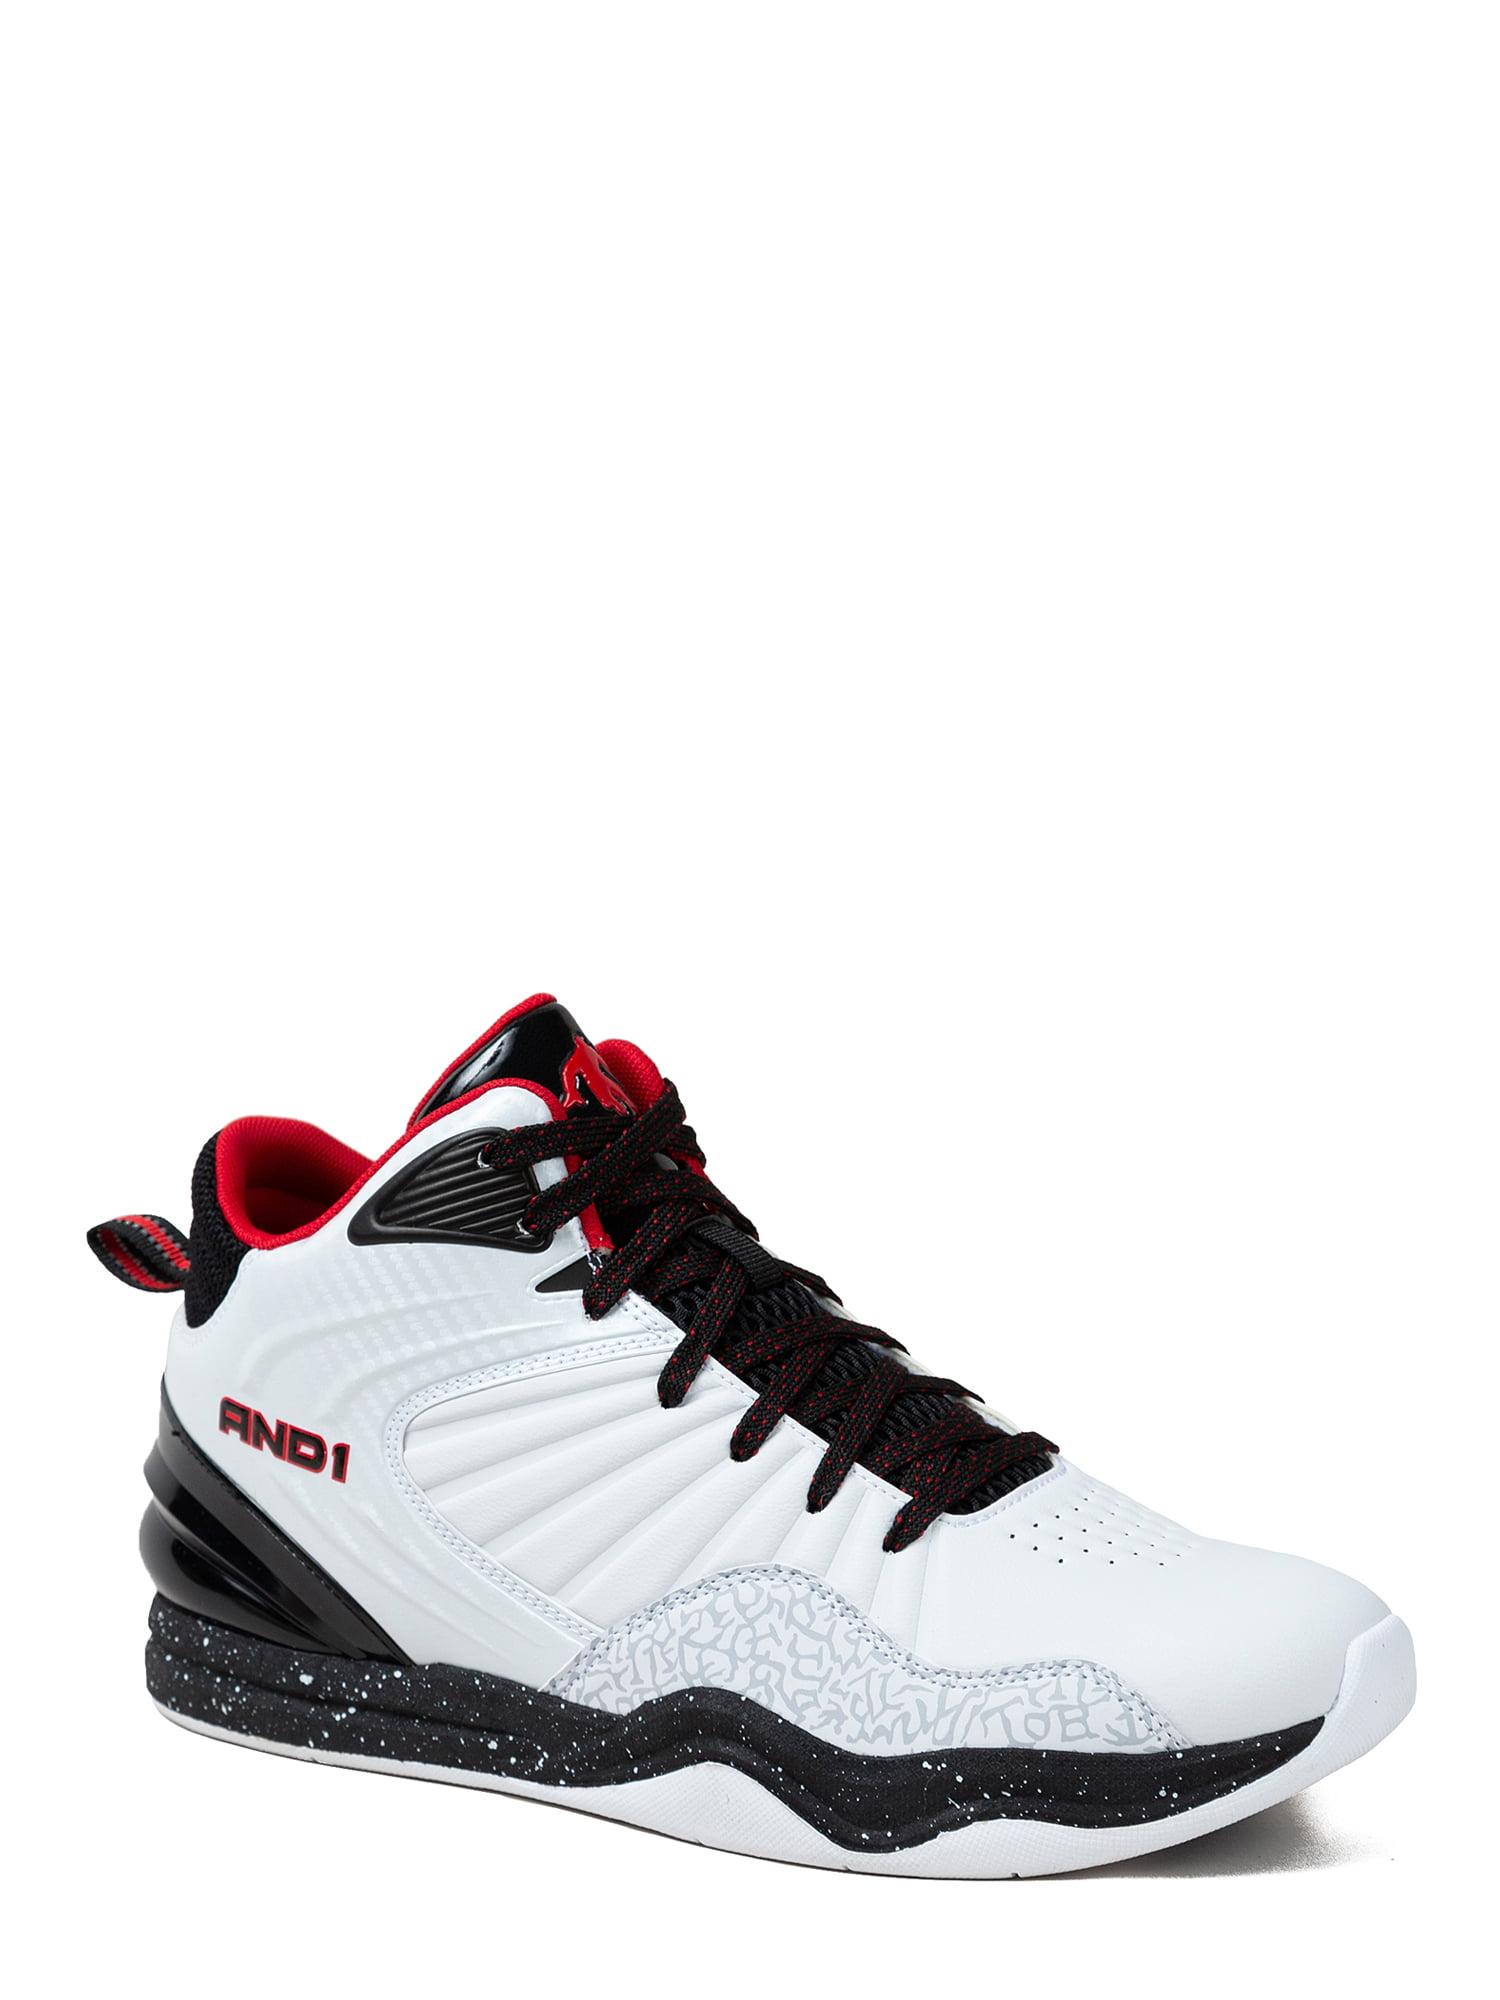 AND1 Men's Capital 4.0 Basketball Shoe